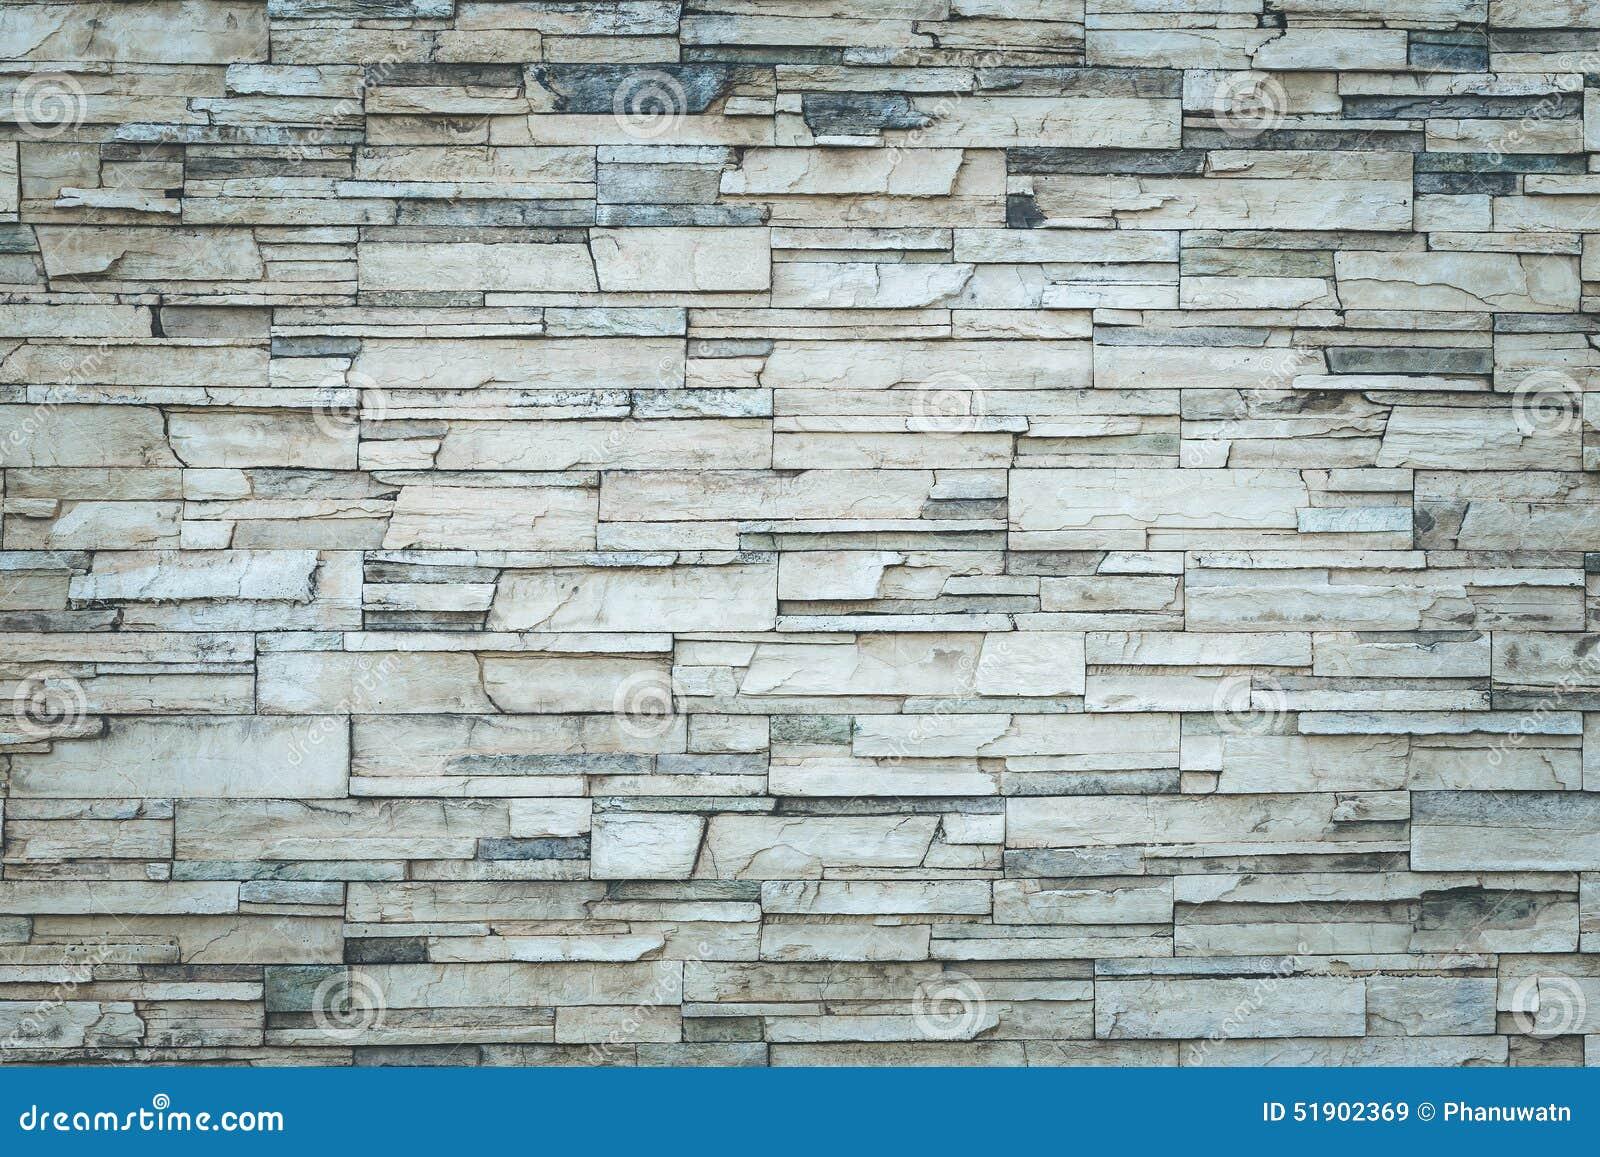 alte natursteinwand stockfoto bild 51902369. Black Bedroom Furniture Sets. Home Design Ideas